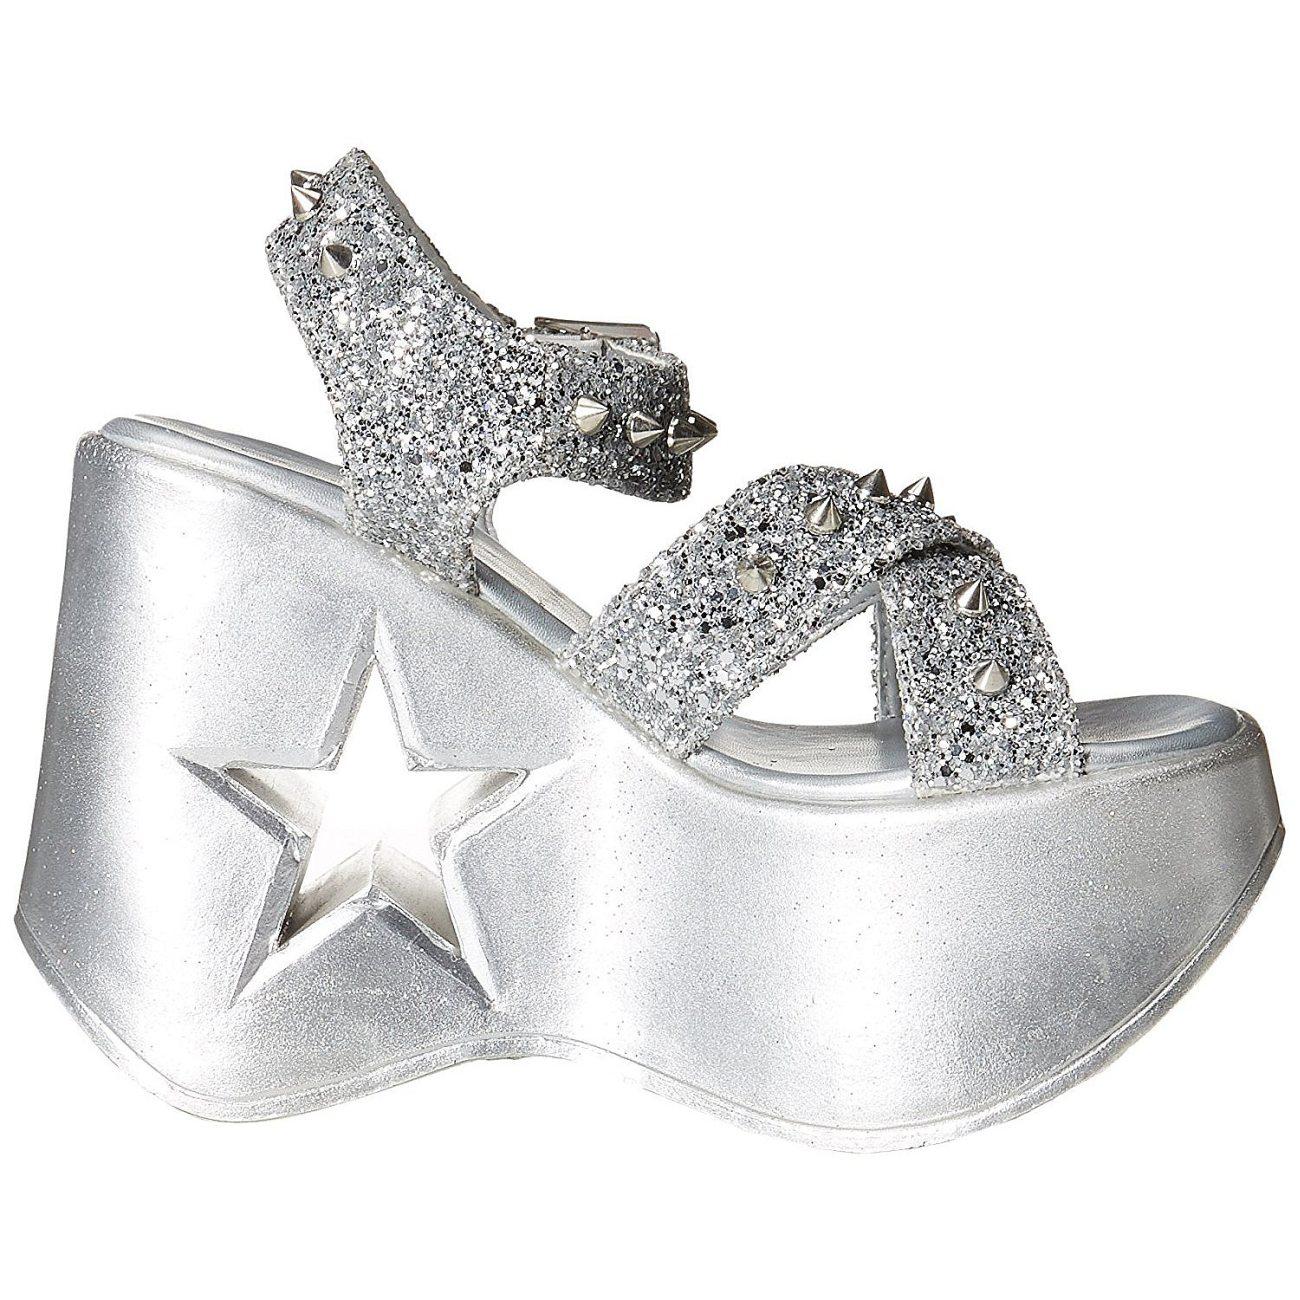 25515d4c959 Silver 13 cm Demonia DYNAMITE-02 lolita sandals wedge sandals